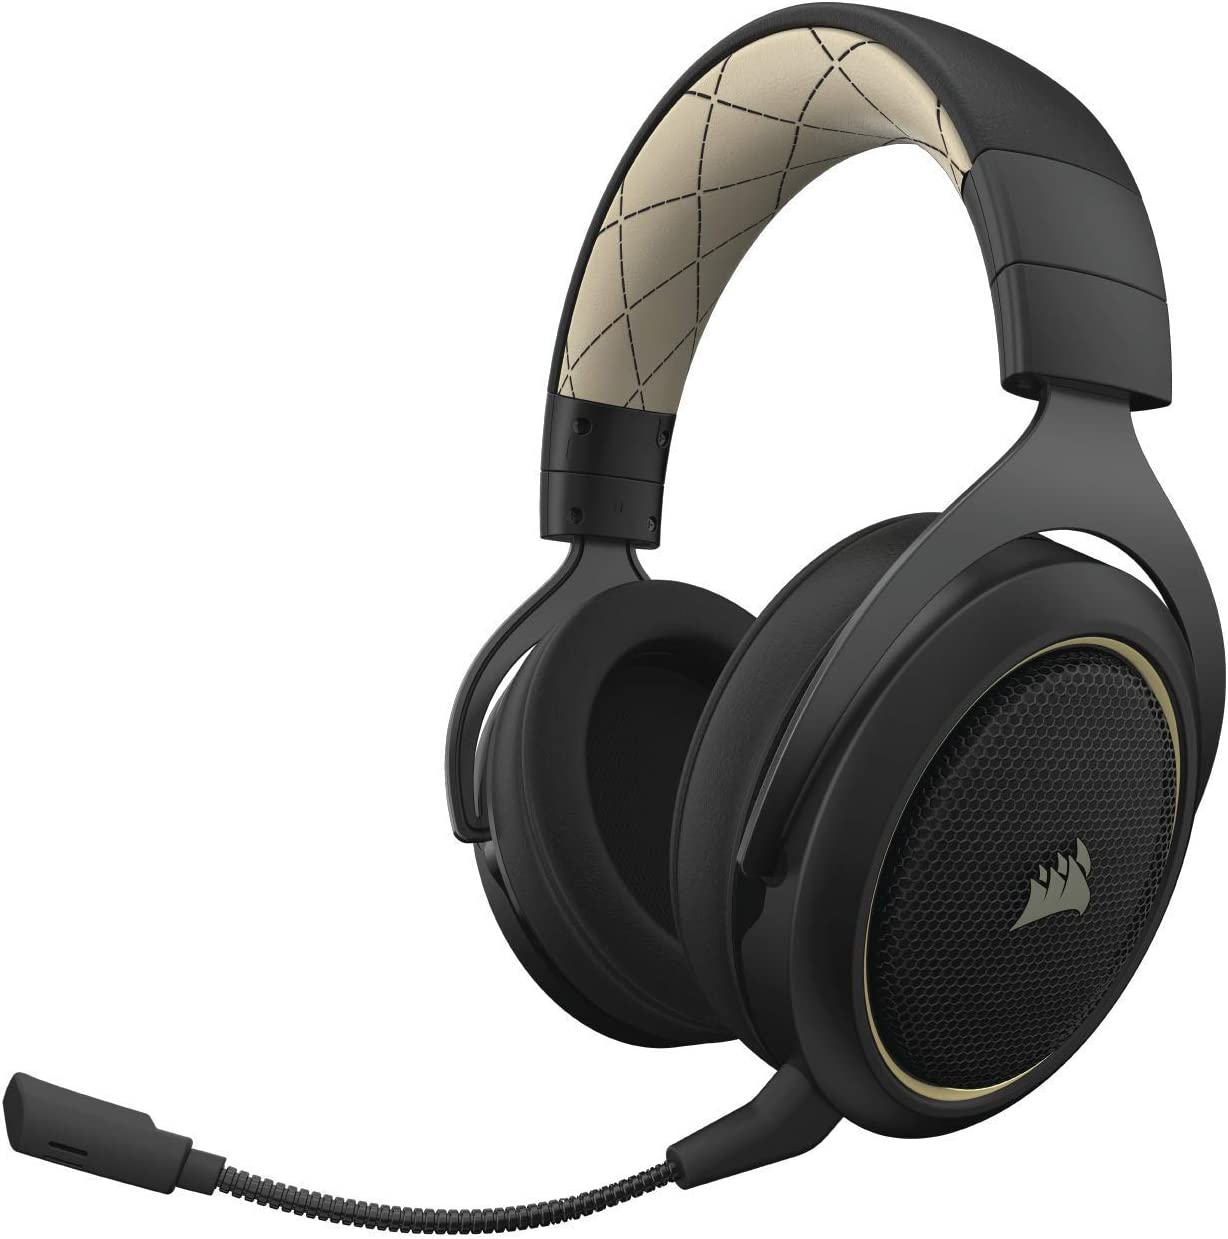 HS70 SE WIRELESS Gaming Headset (Renewed)